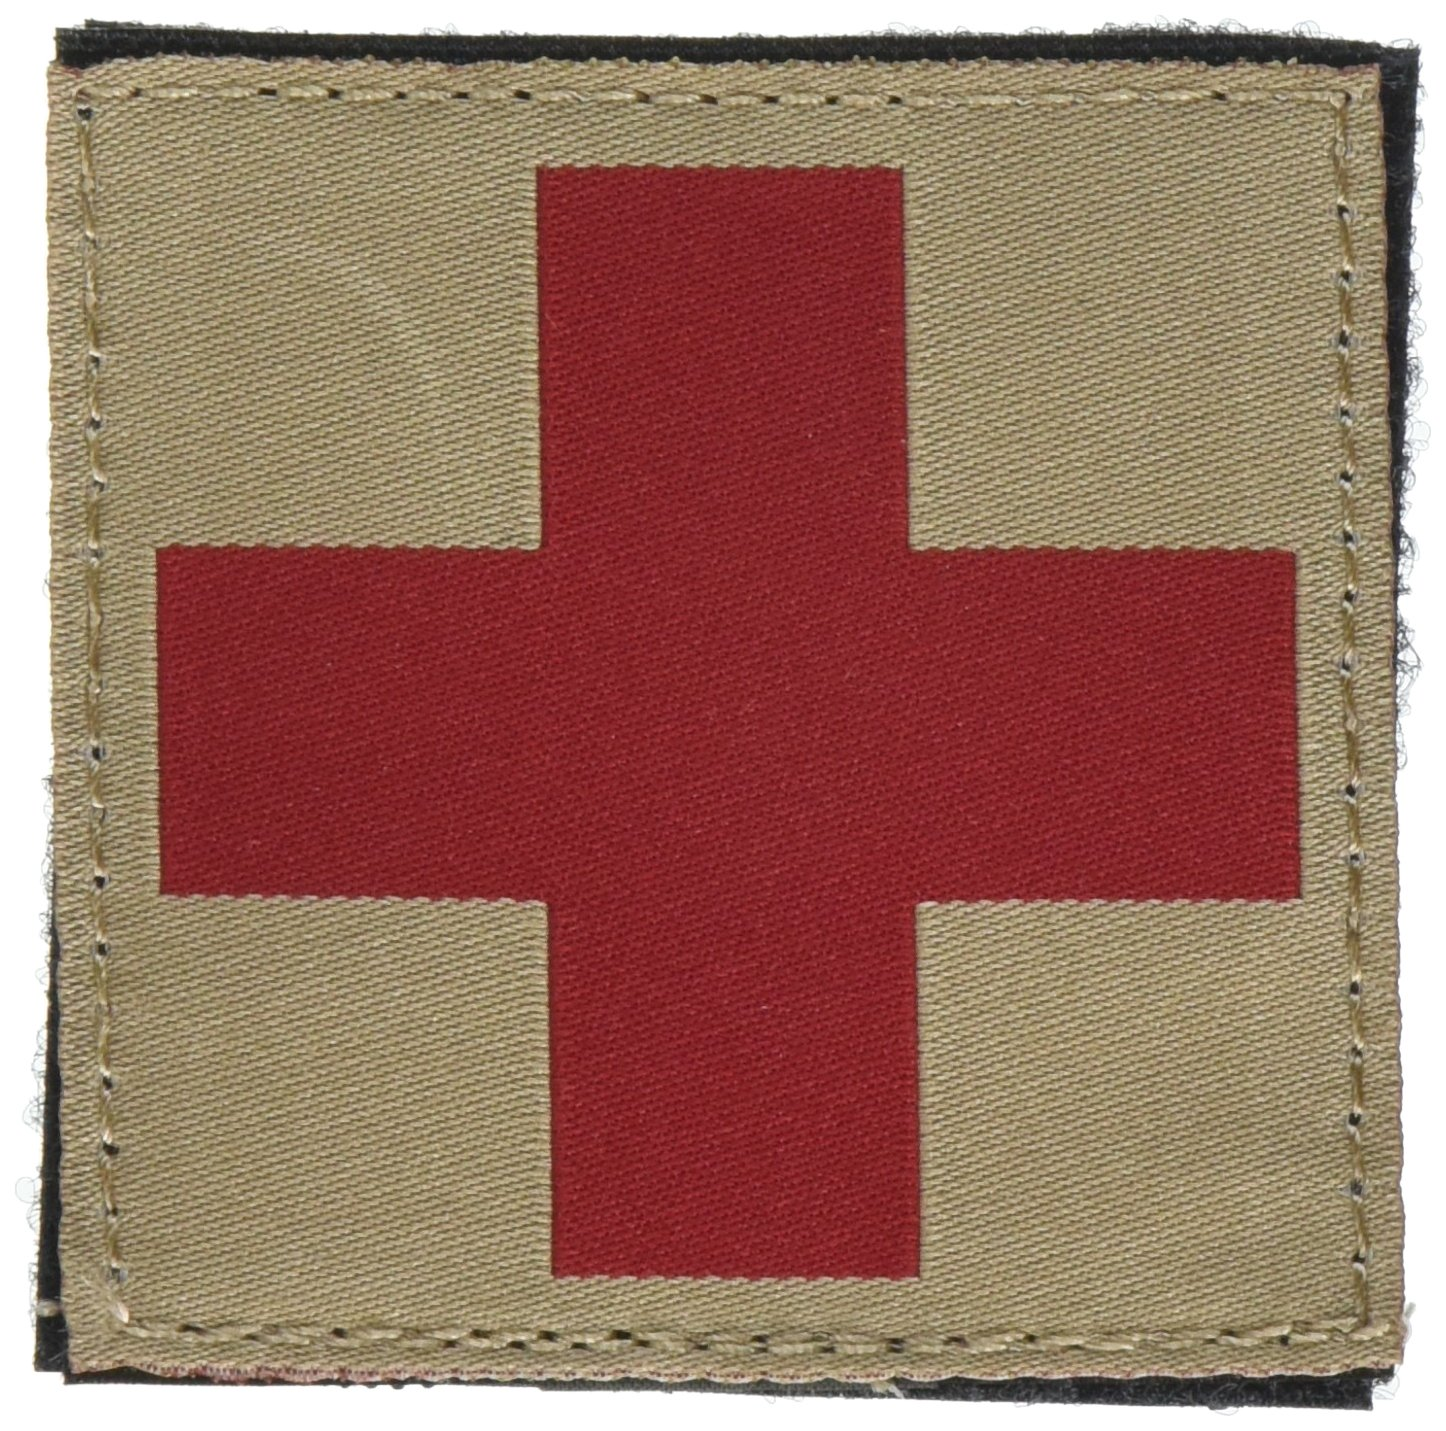 BLACKHAWK! Red Cross ID Patch - Coyote Tan